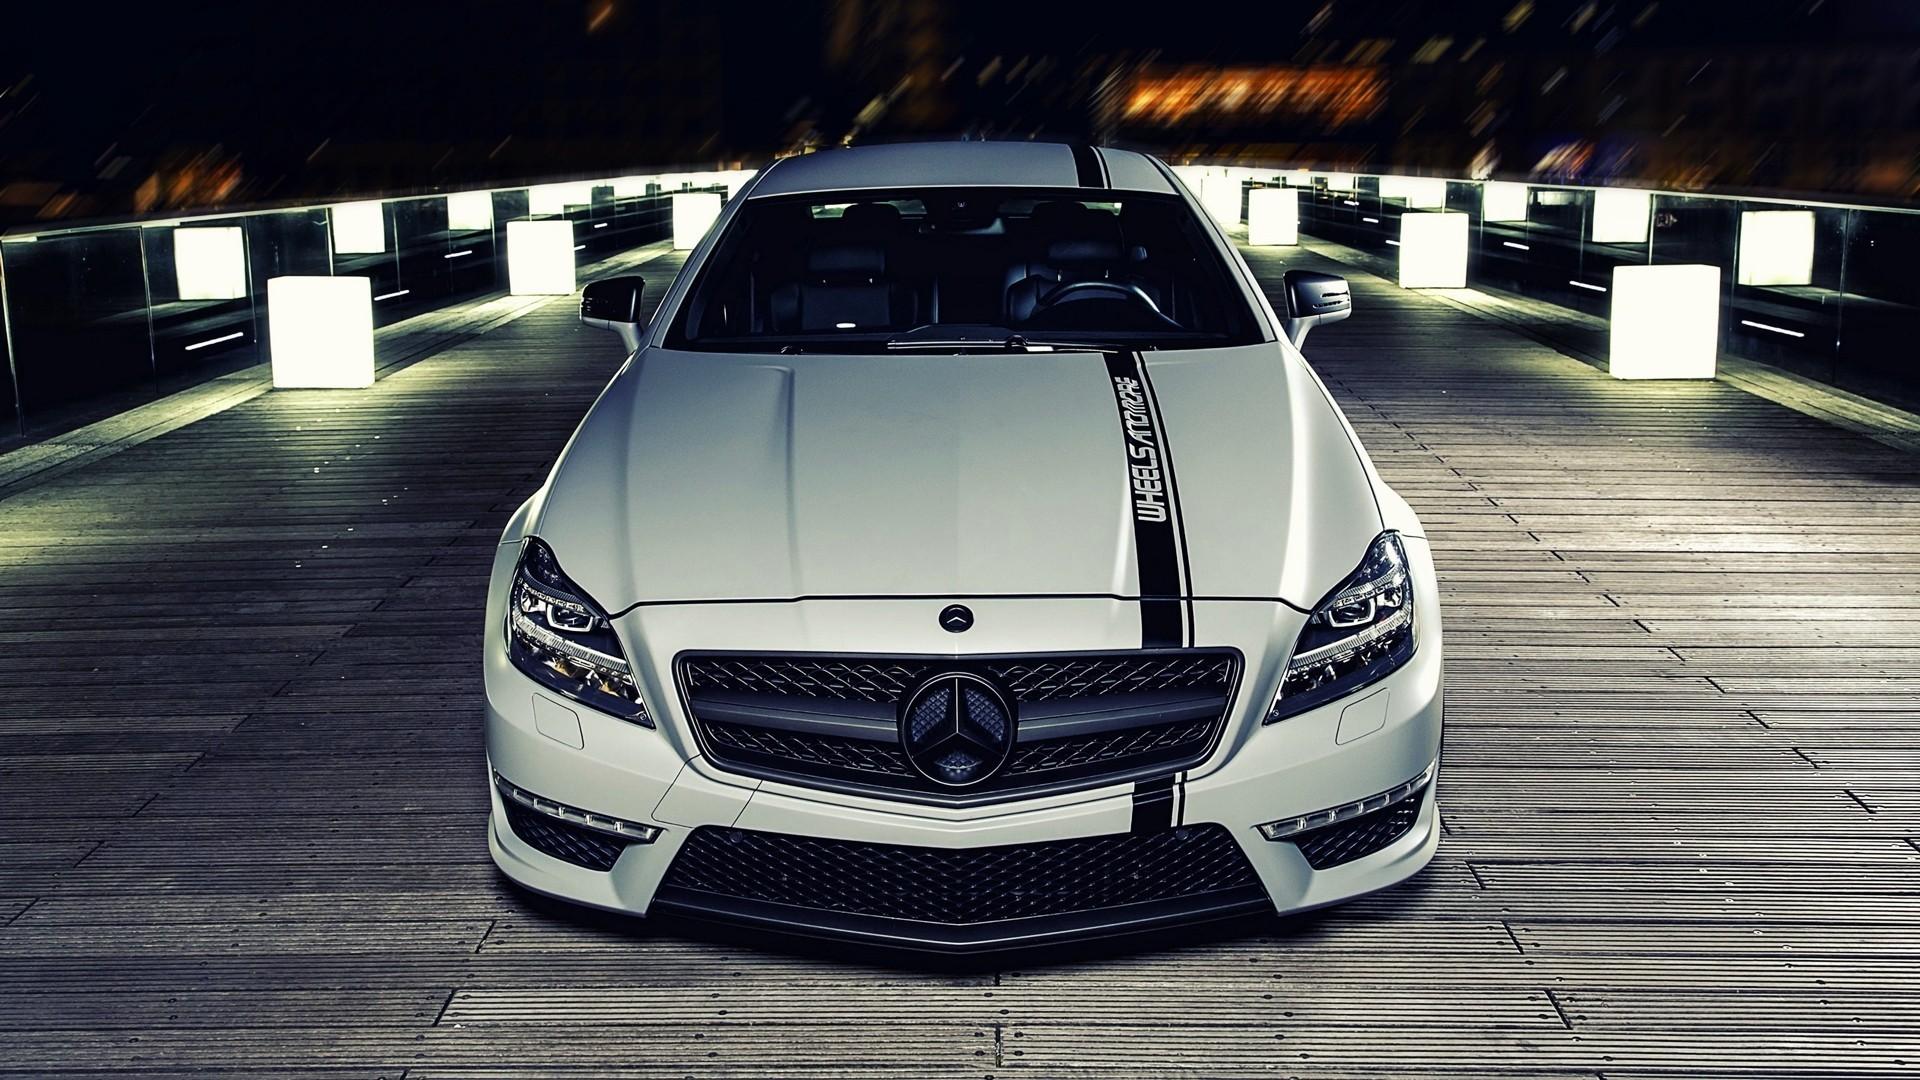 General 1920x1080 Mercedes-Benz supercars car vehicle white cars